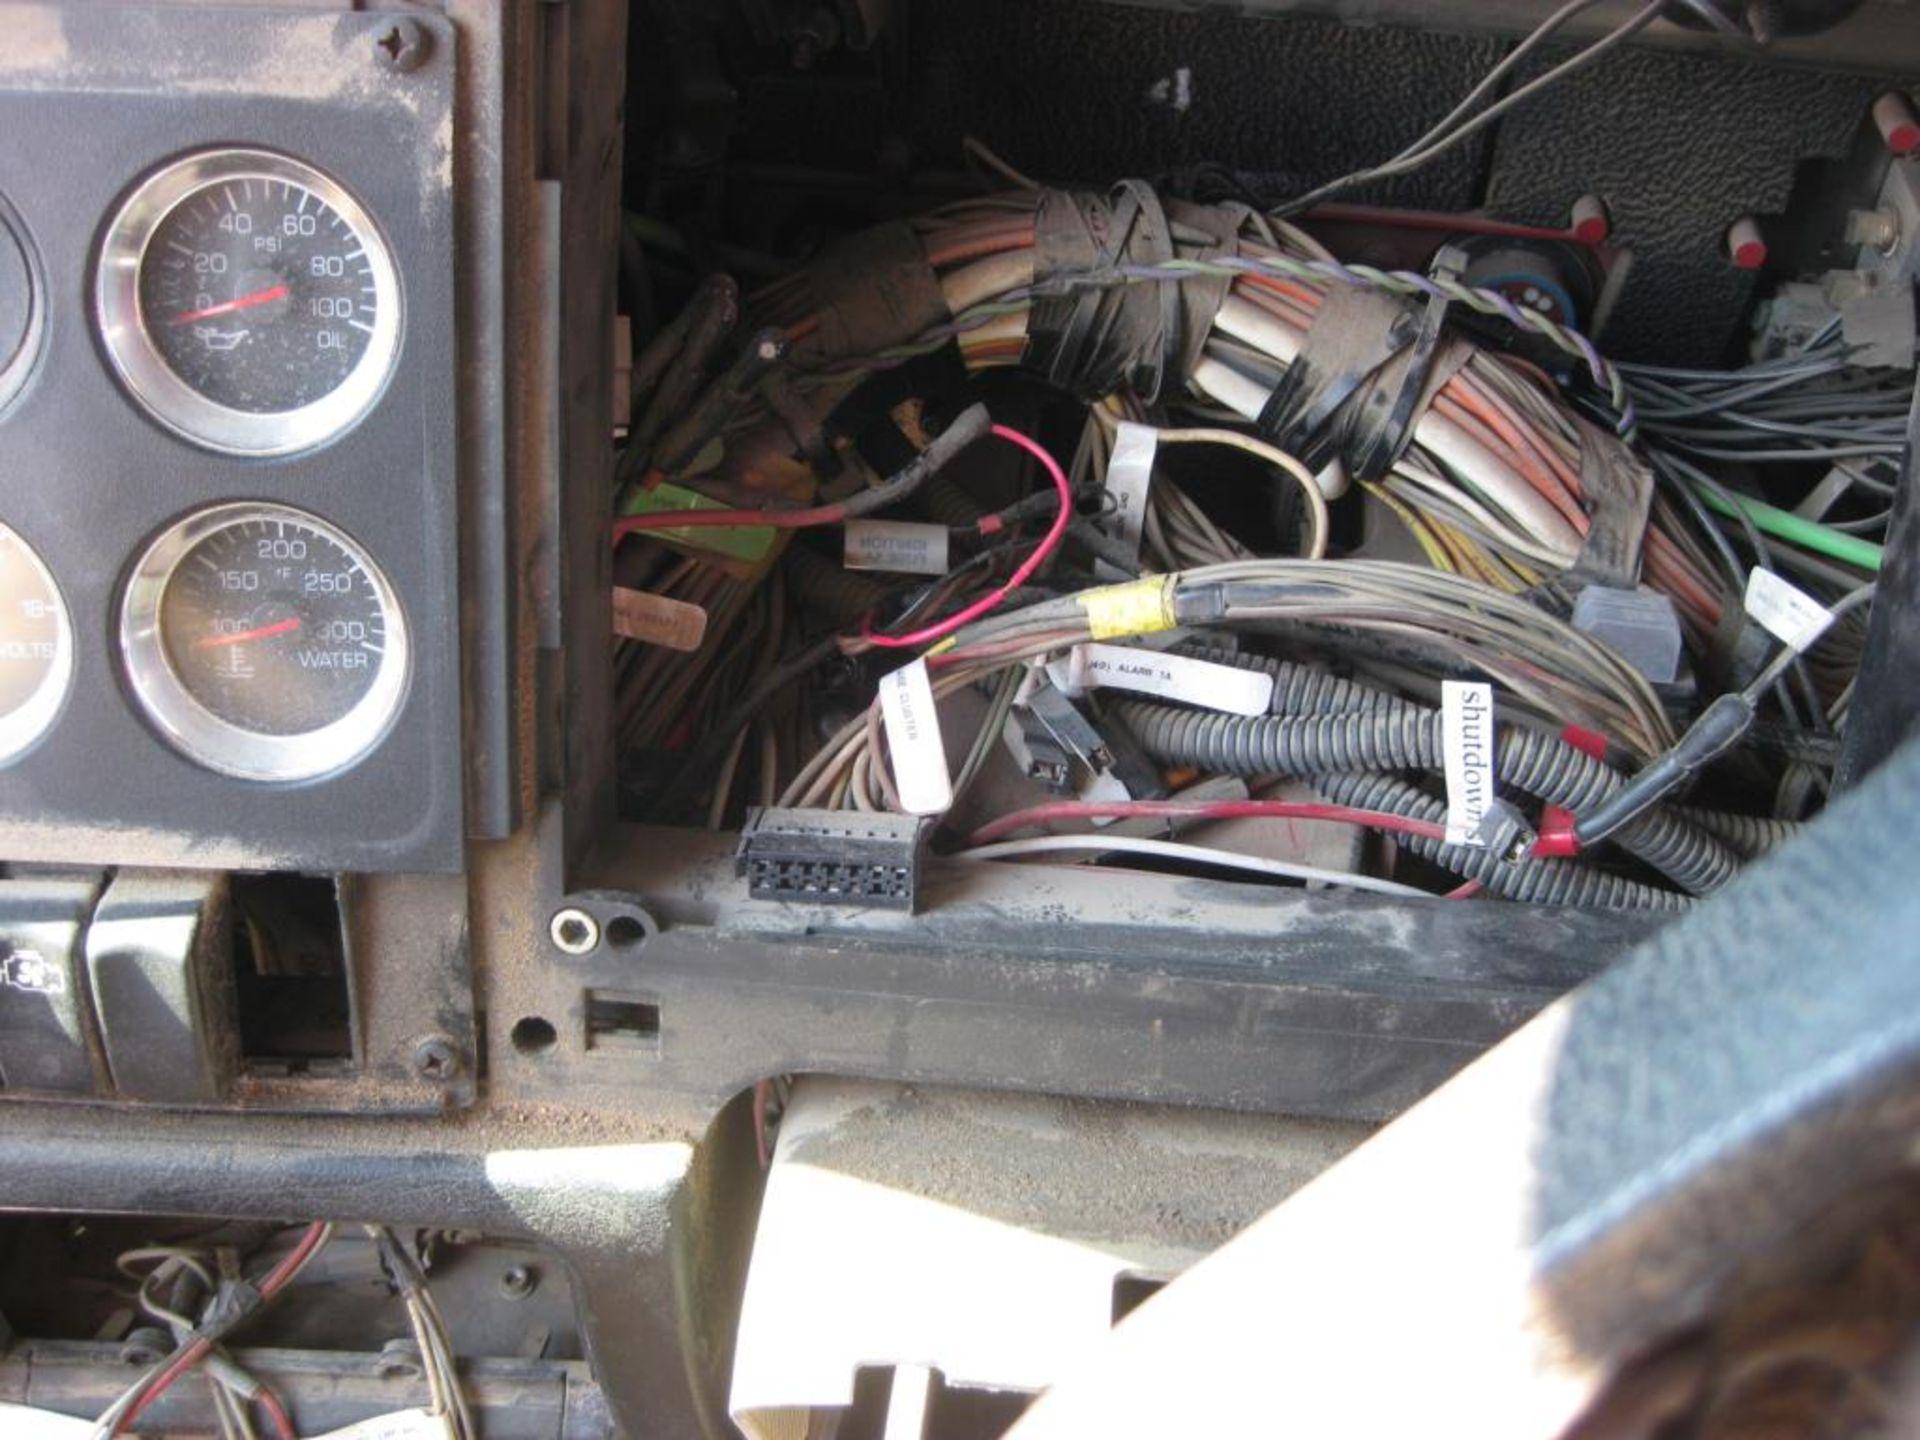 Kenworth Truck - Image 16 of 22